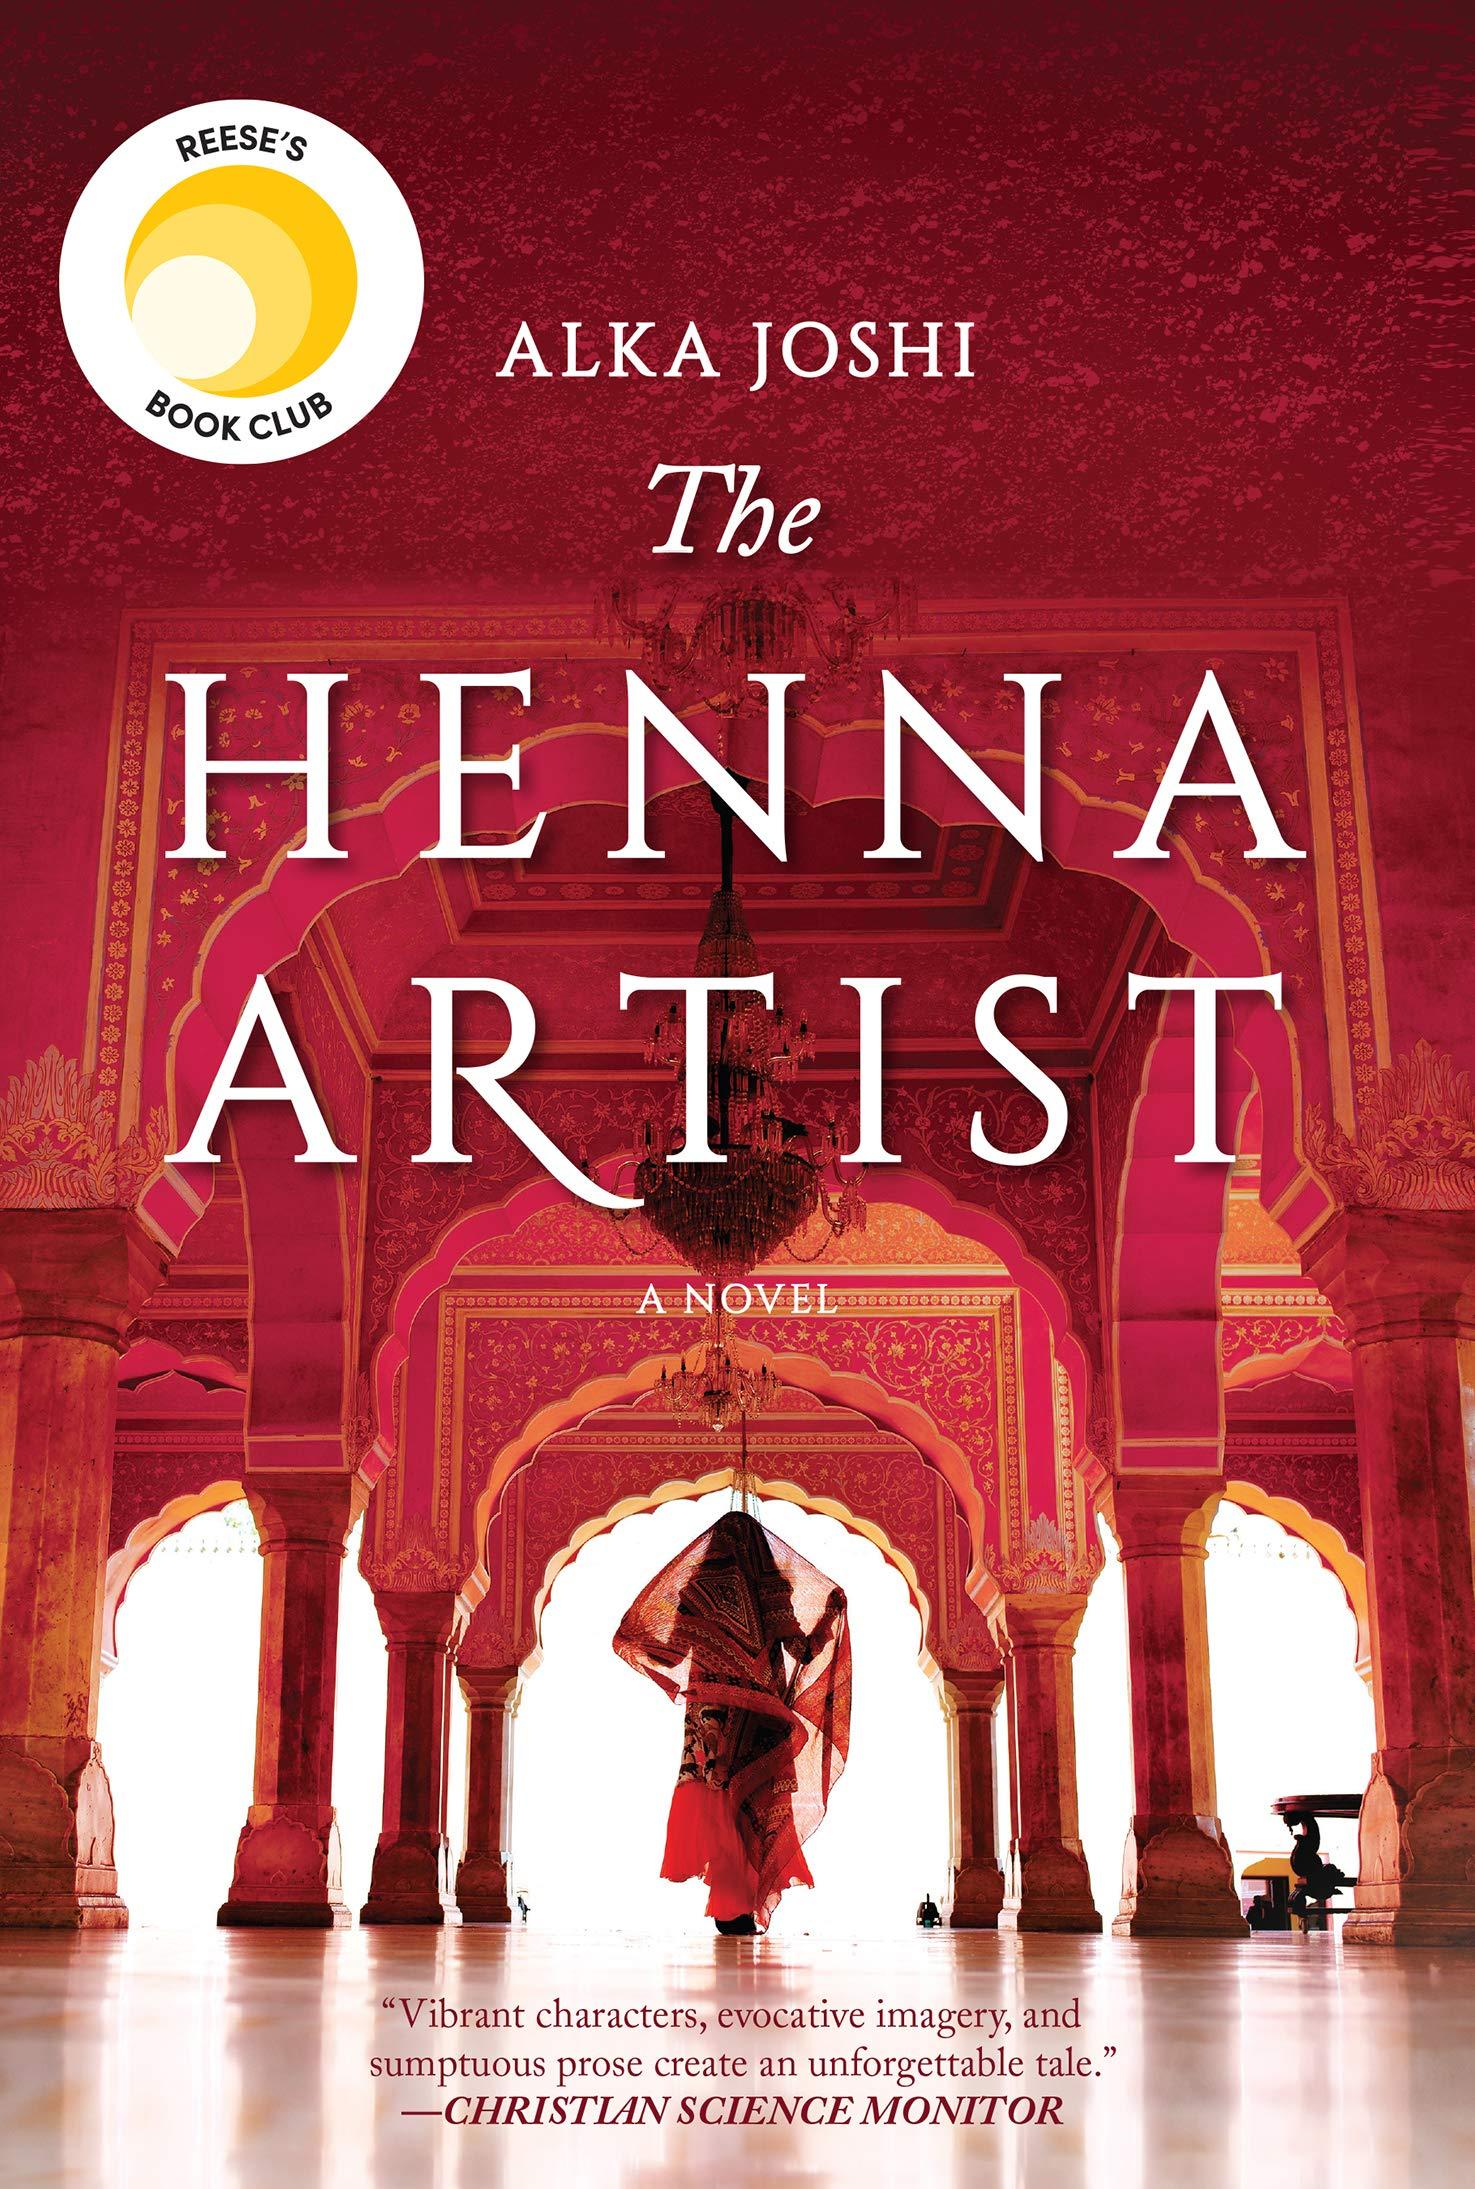 Amazon.com: The Henna Artist: A Novel (The Jaipur Trilogy, 1)  (9780778309451): Joshi, Alka: Books